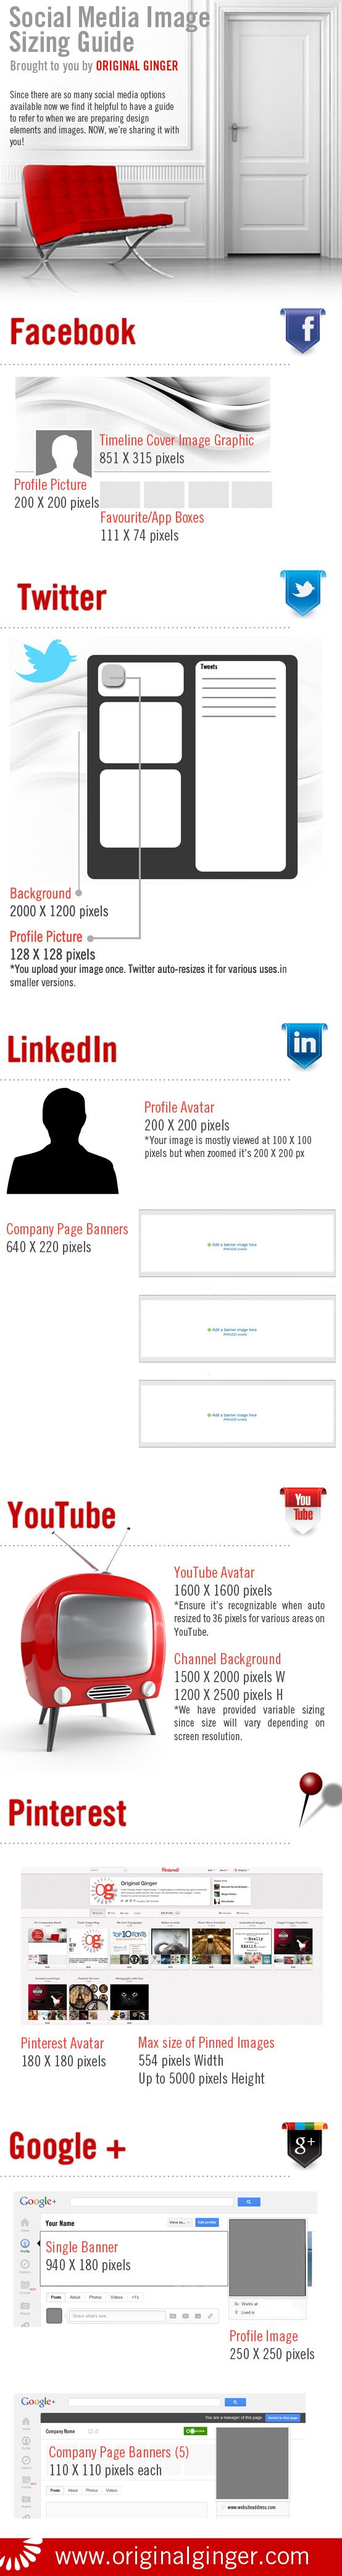 #SocialMedia Image Size #Infographic